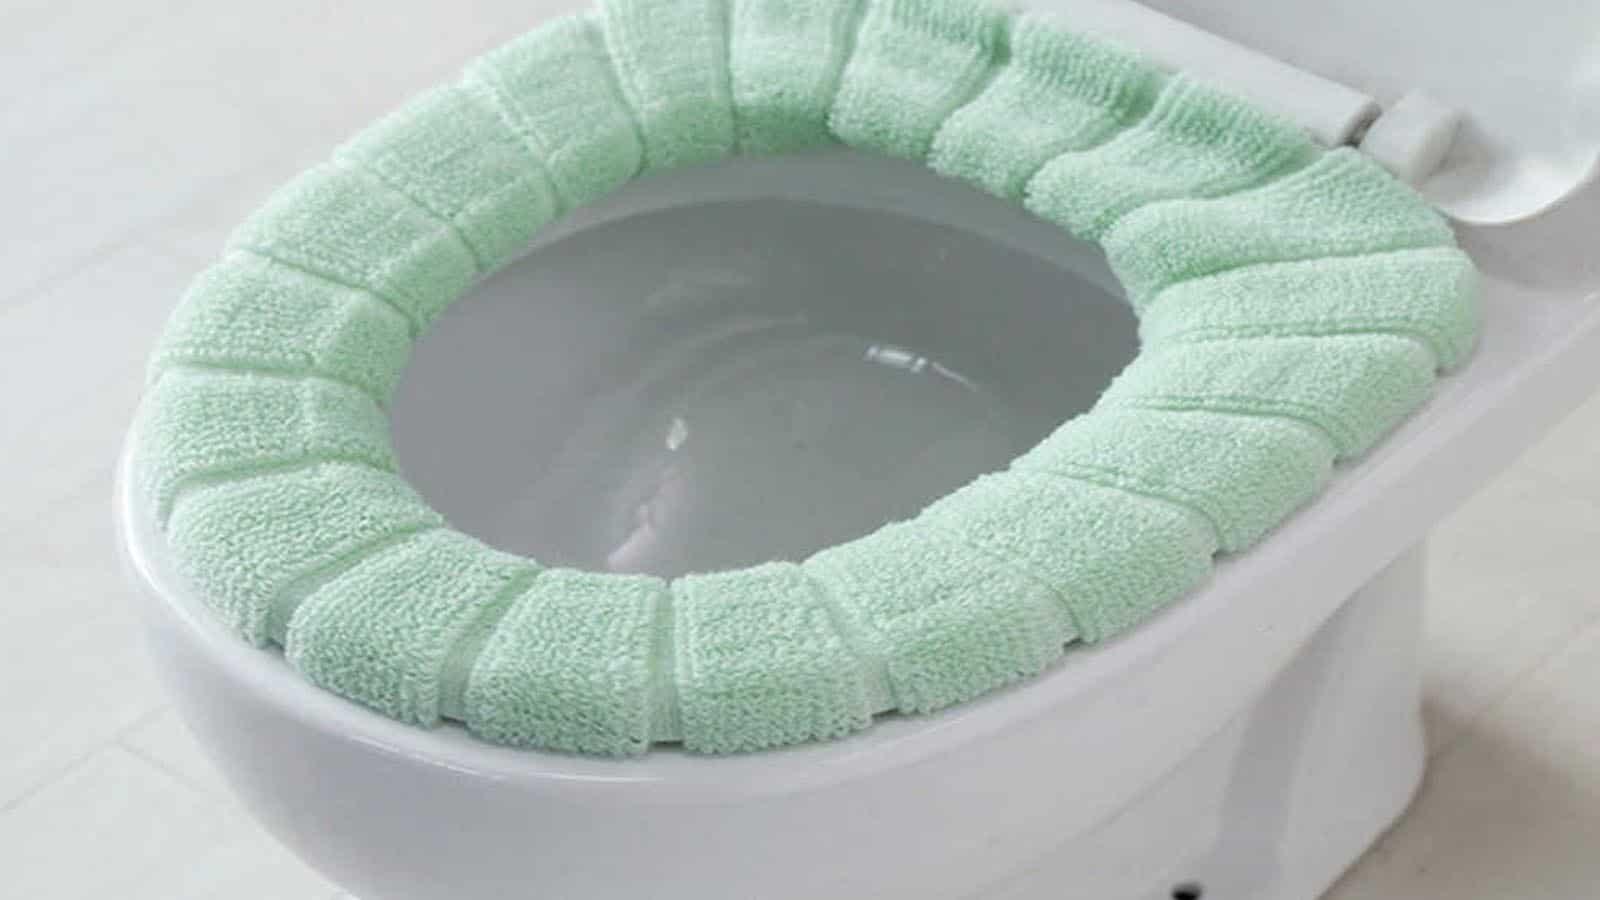 fuzzy toilet cover on ali express